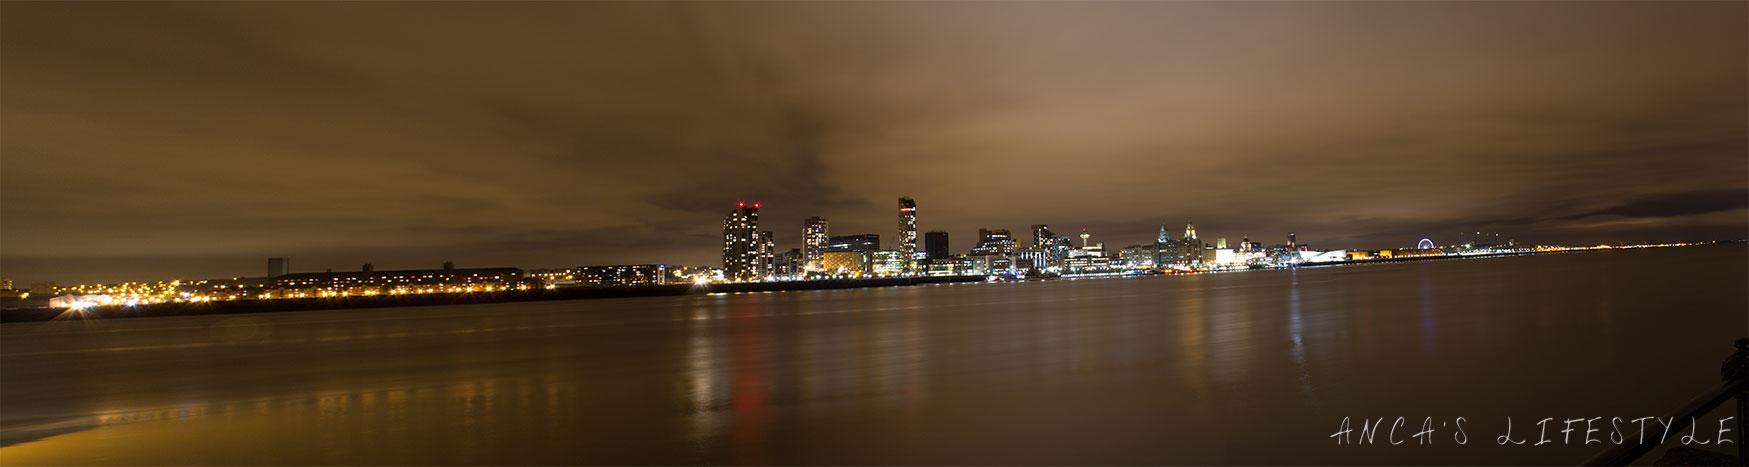 Liverpool panorama